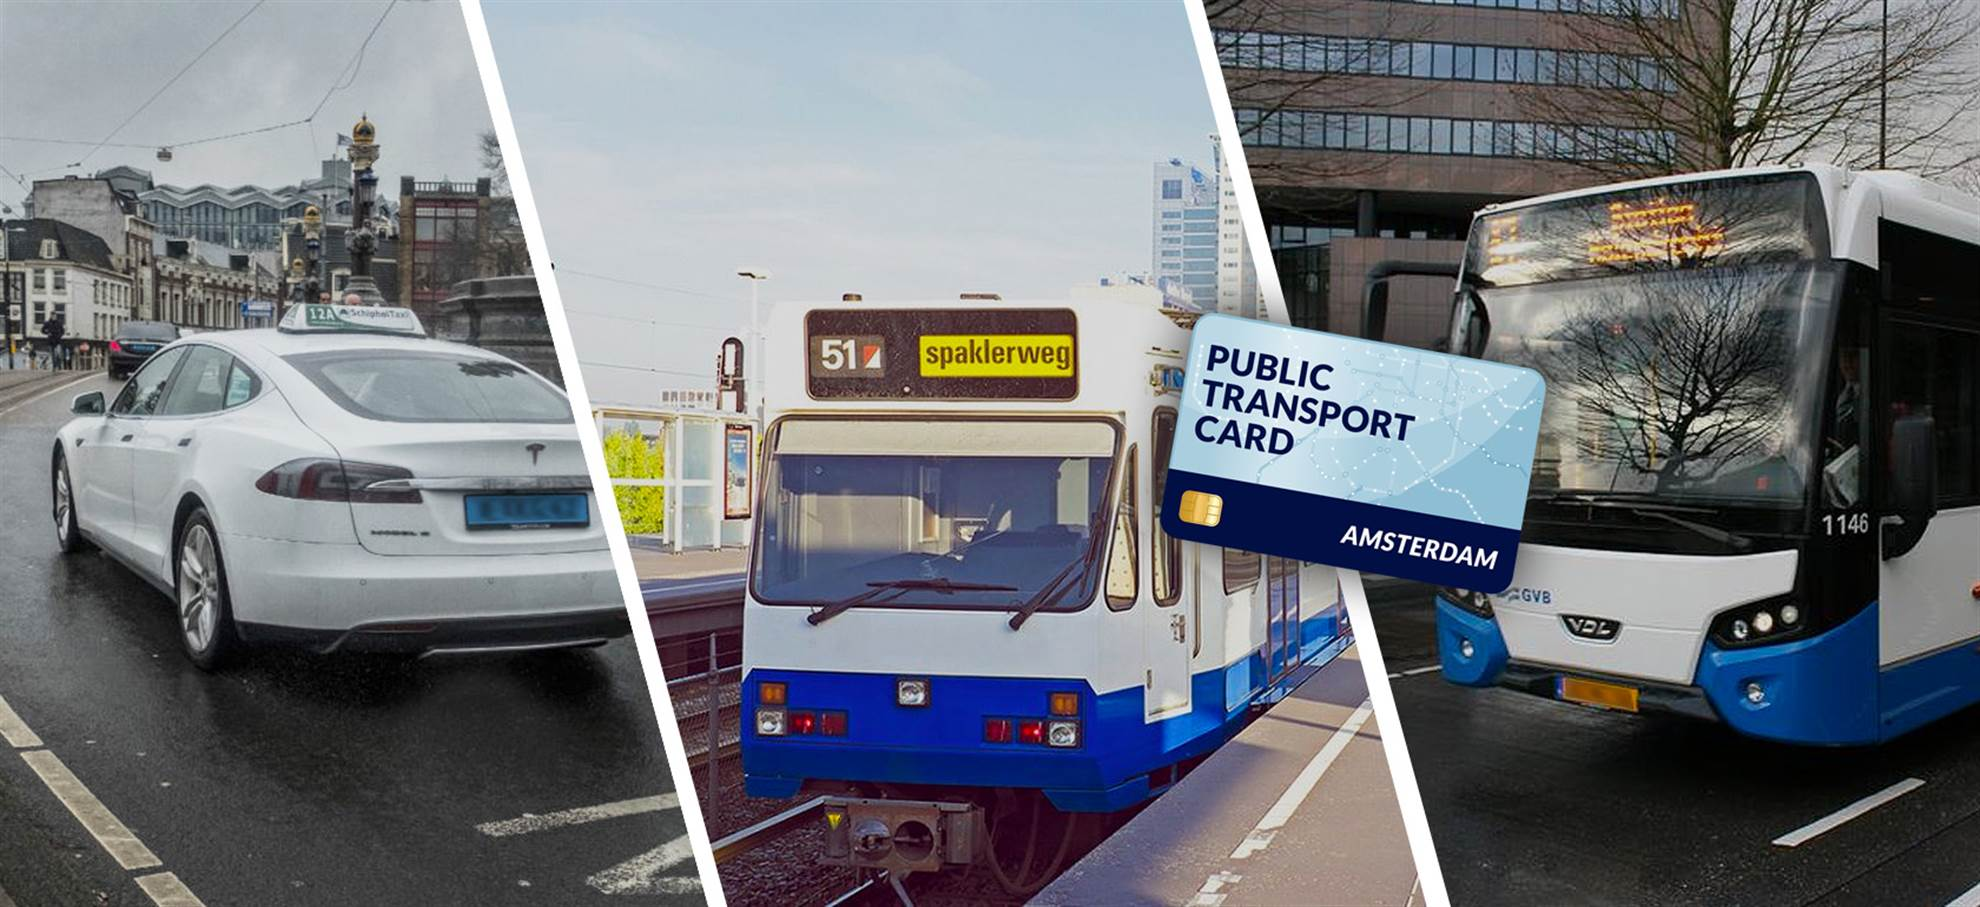 Амстердам Travel Card